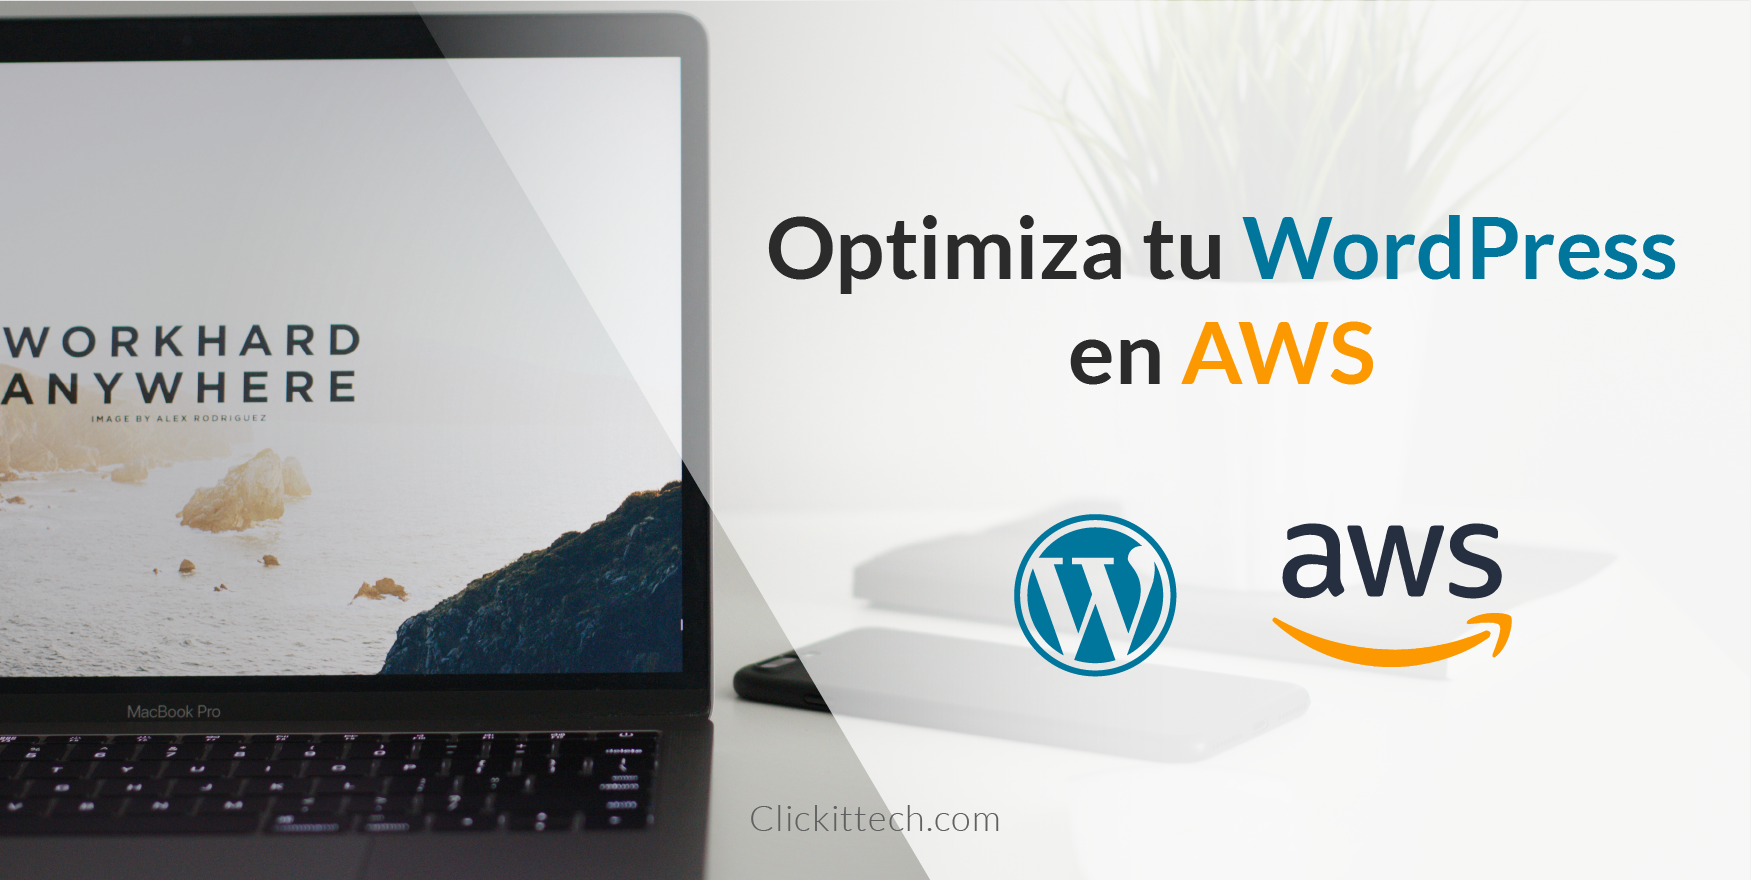 Optimize WordPress Site en AWS - WordPress Optimization Clic